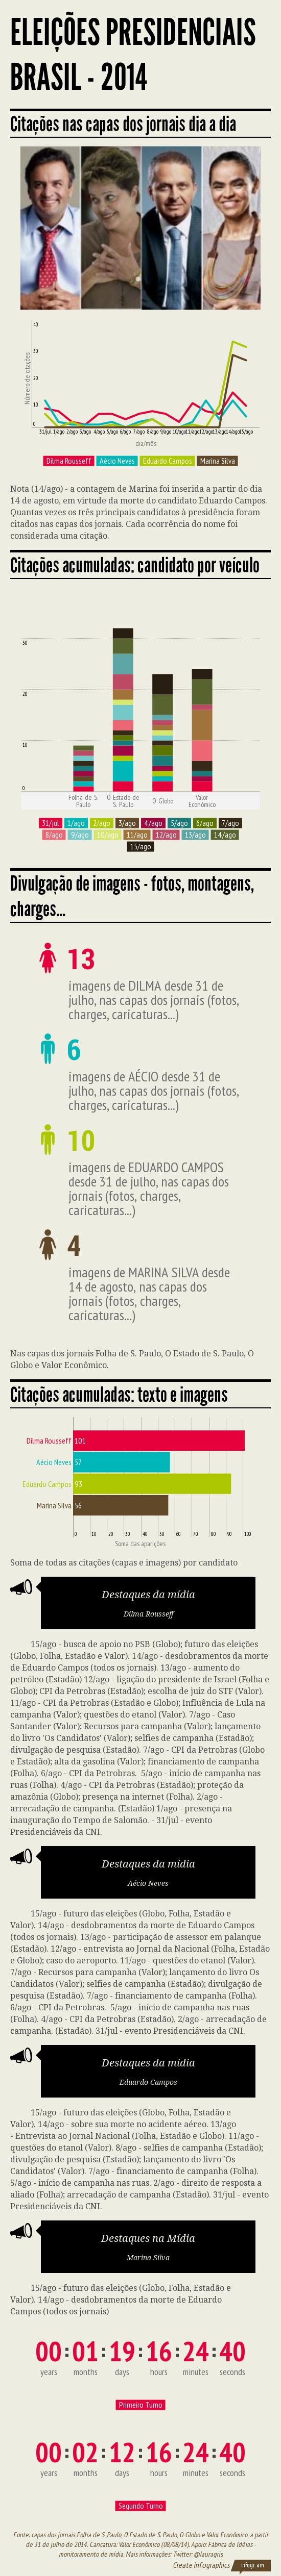 Eleicoes_Presidenciais_Brasil__2014